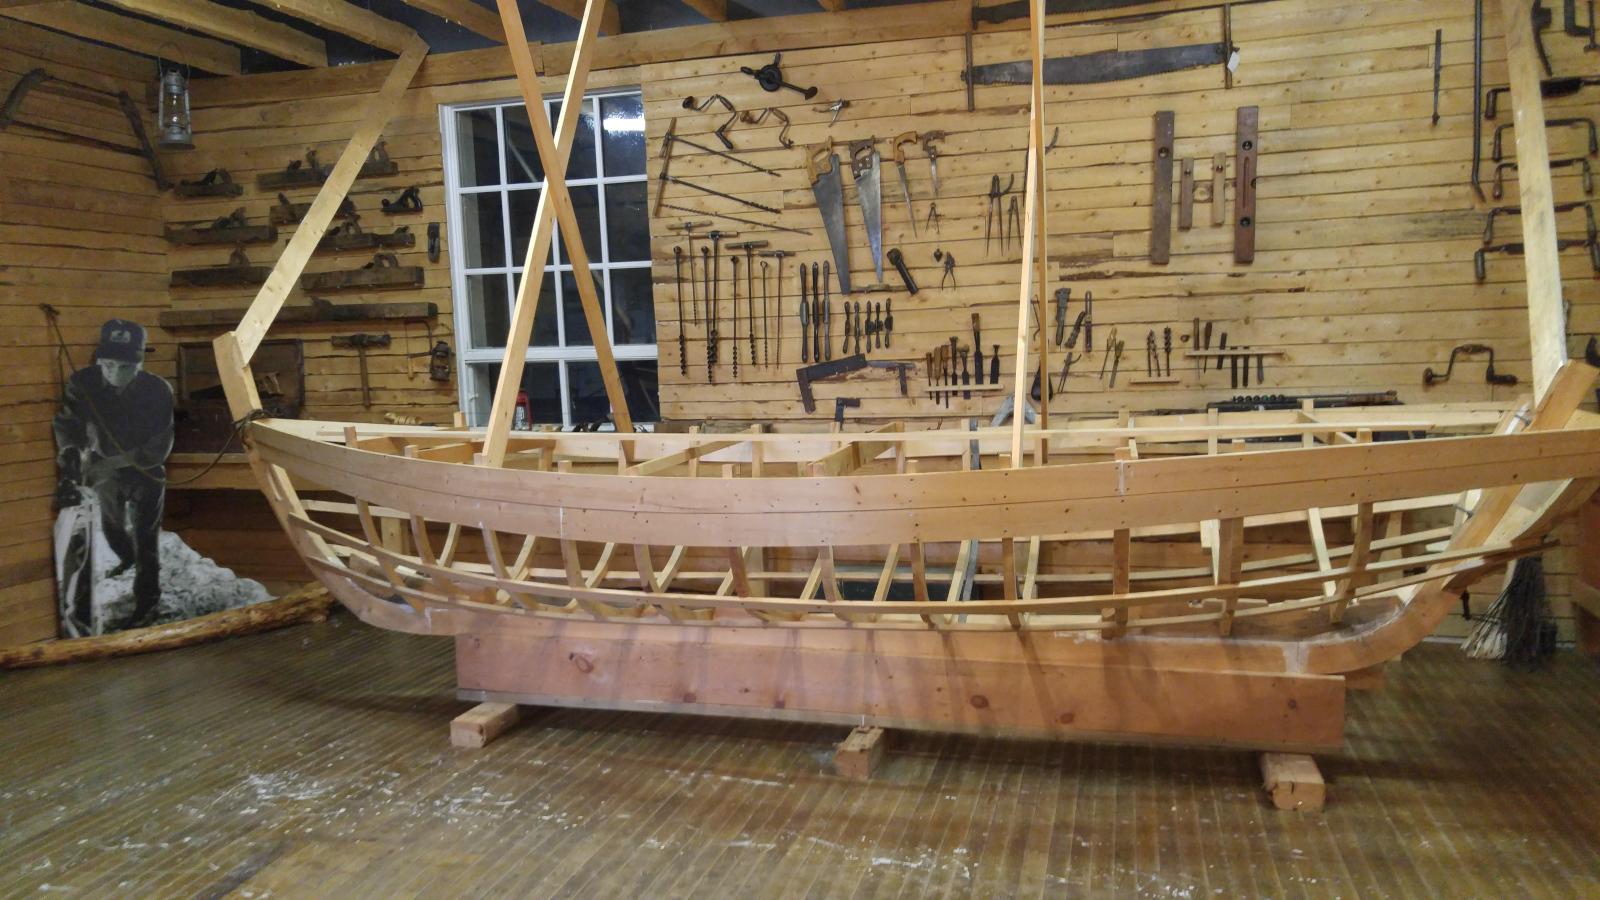 Wooden Boat Museum Bobs Newfoundland Winterton Nl